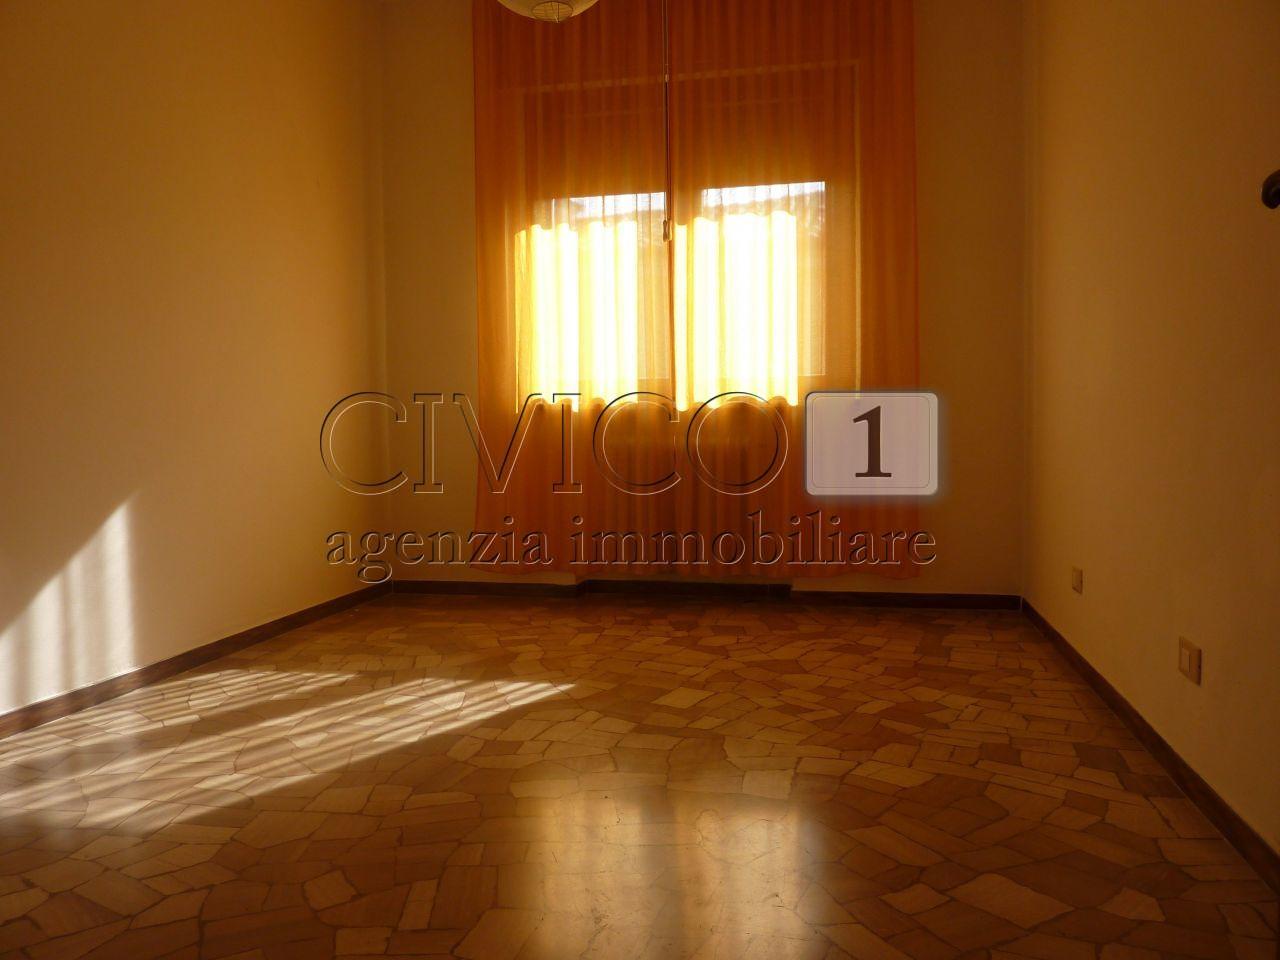 Appartamento - Tricamere a Stanga, Vicenza